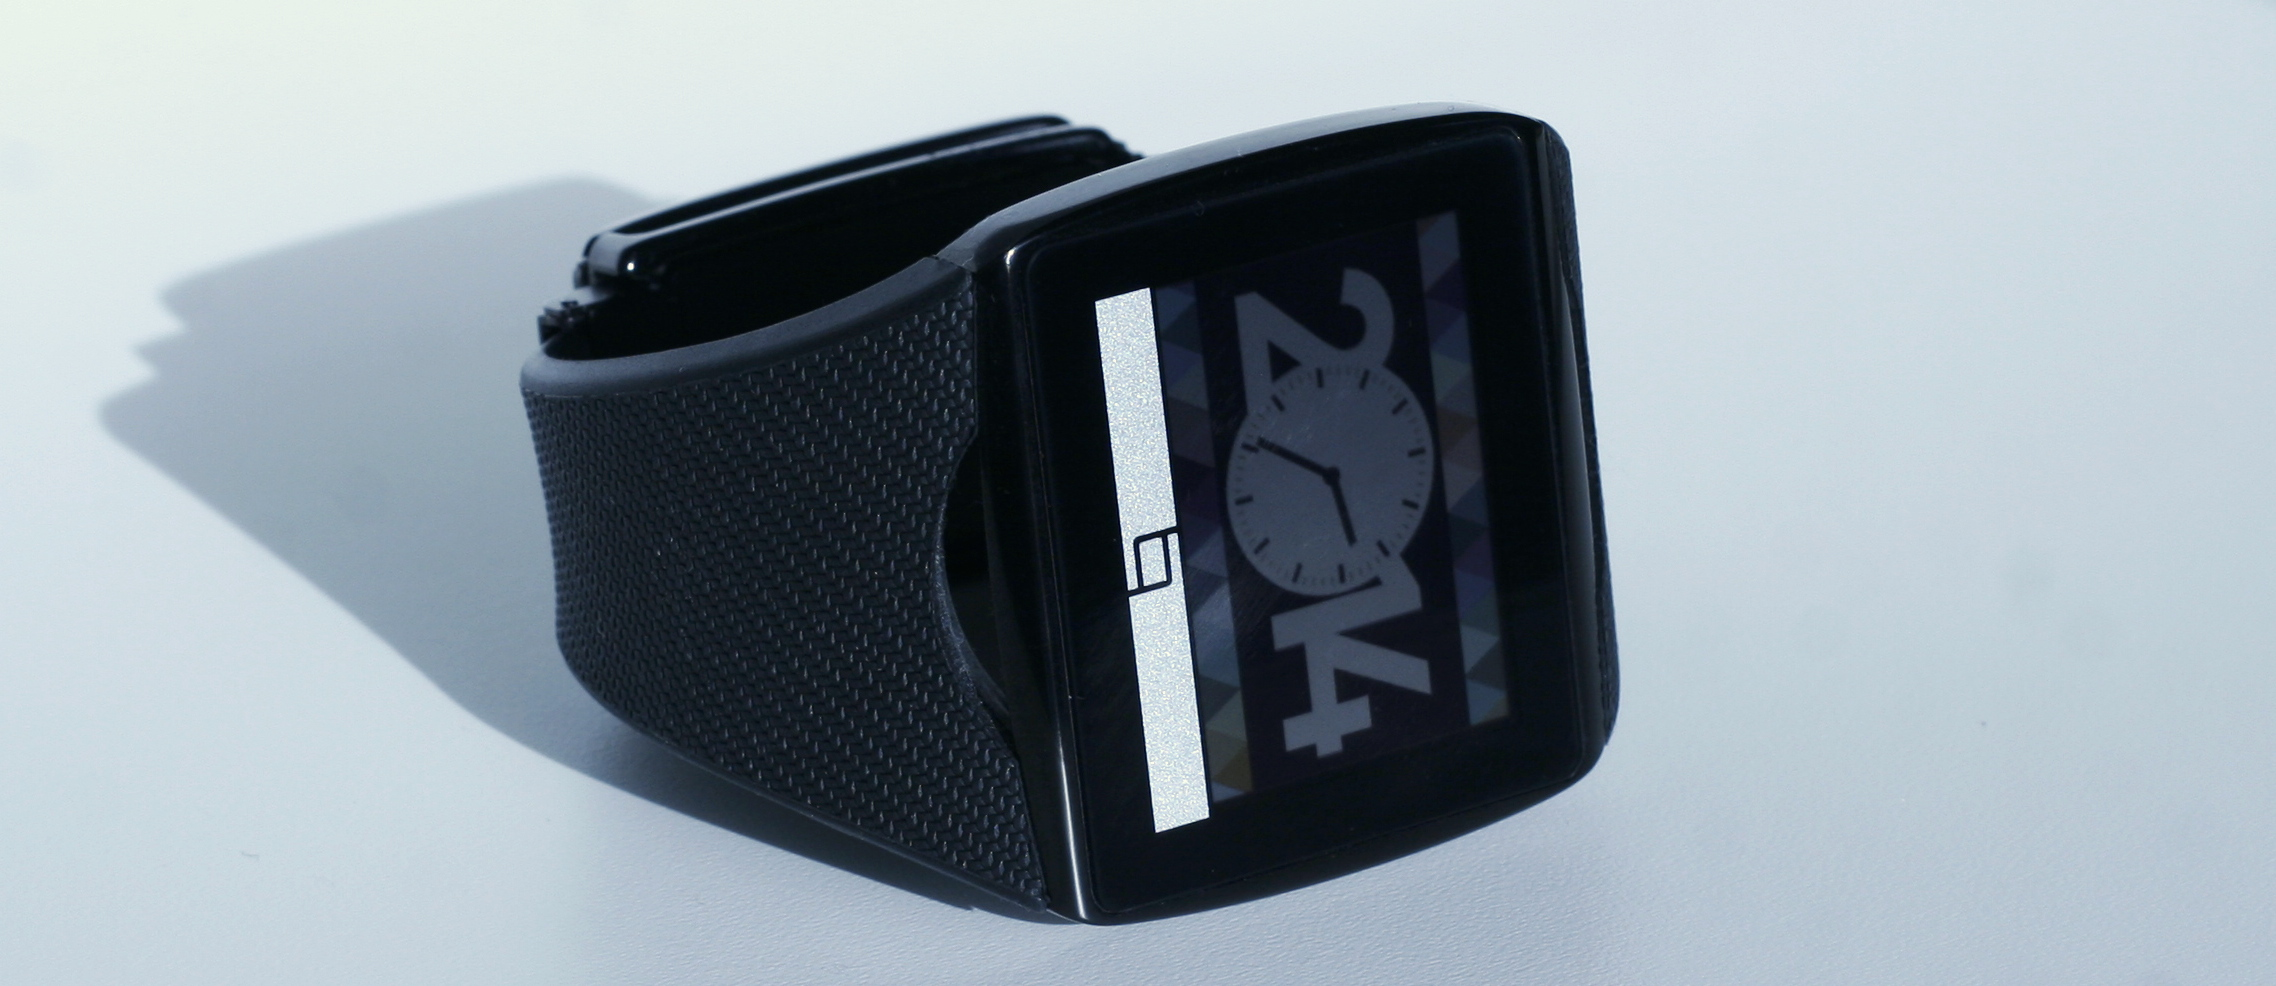 Qualcomm Toq Smartwatch: Interesting Concept, Unfortunate Execution